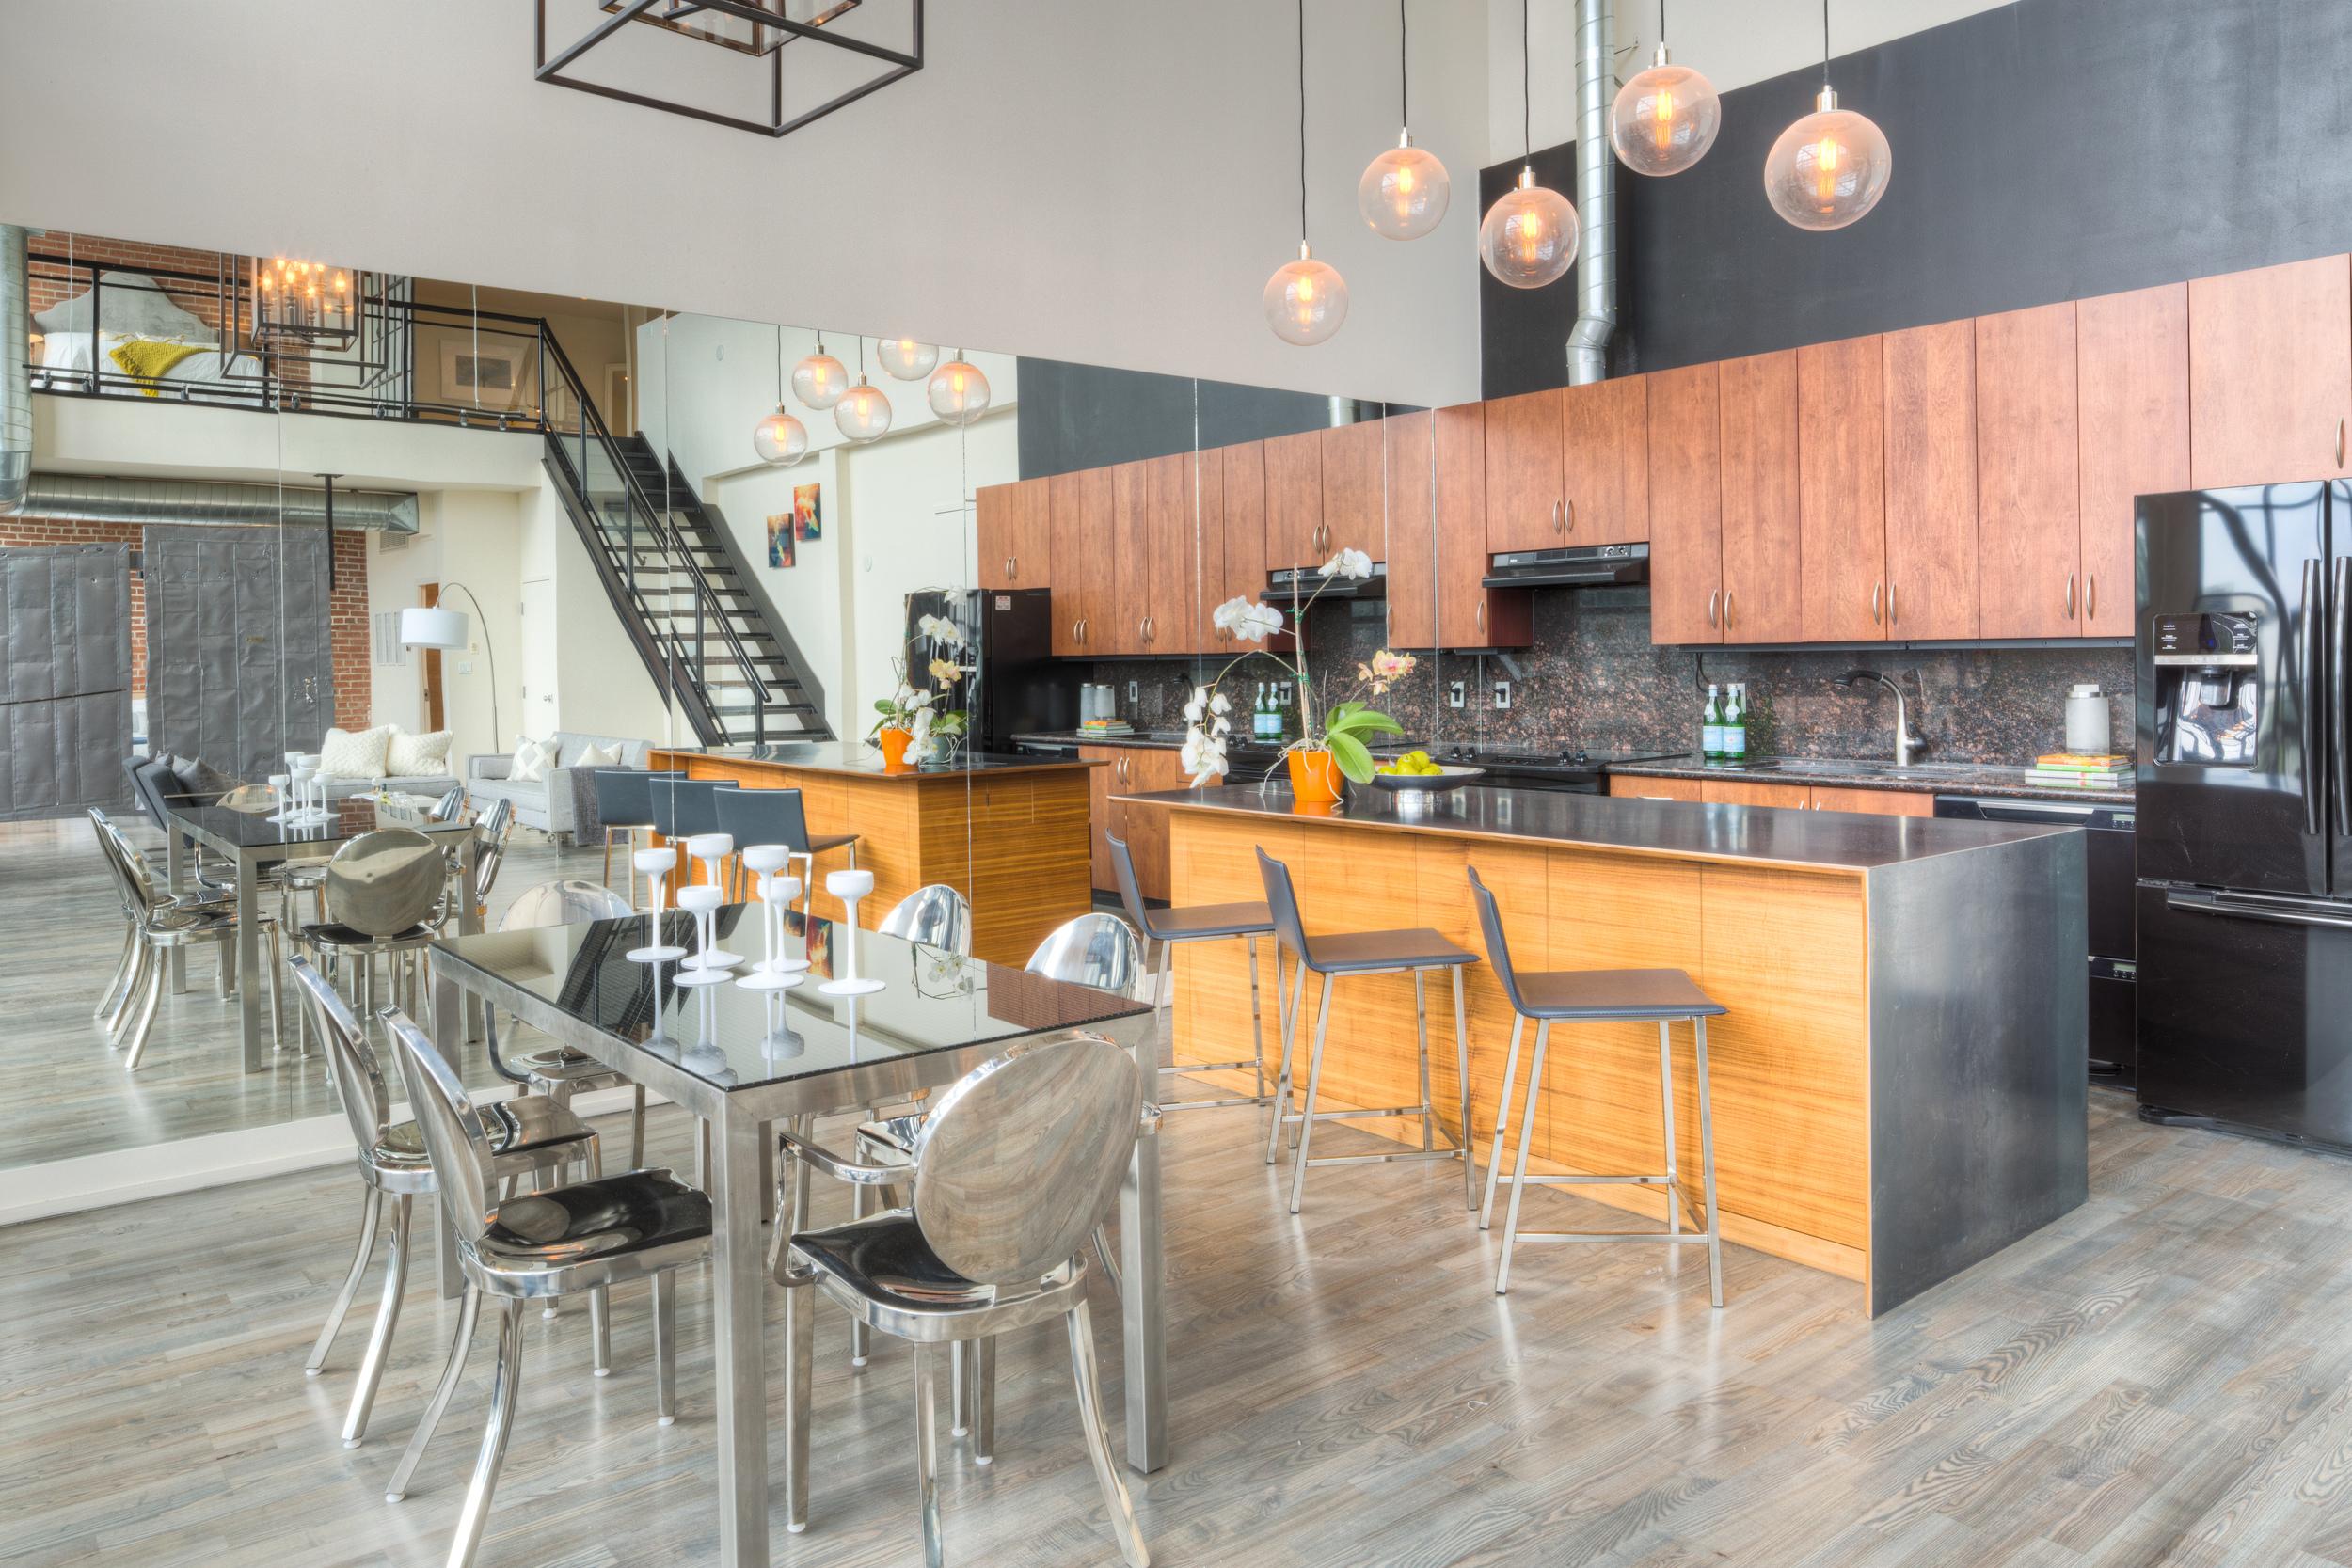 Loft Staging for Sale - kitchen